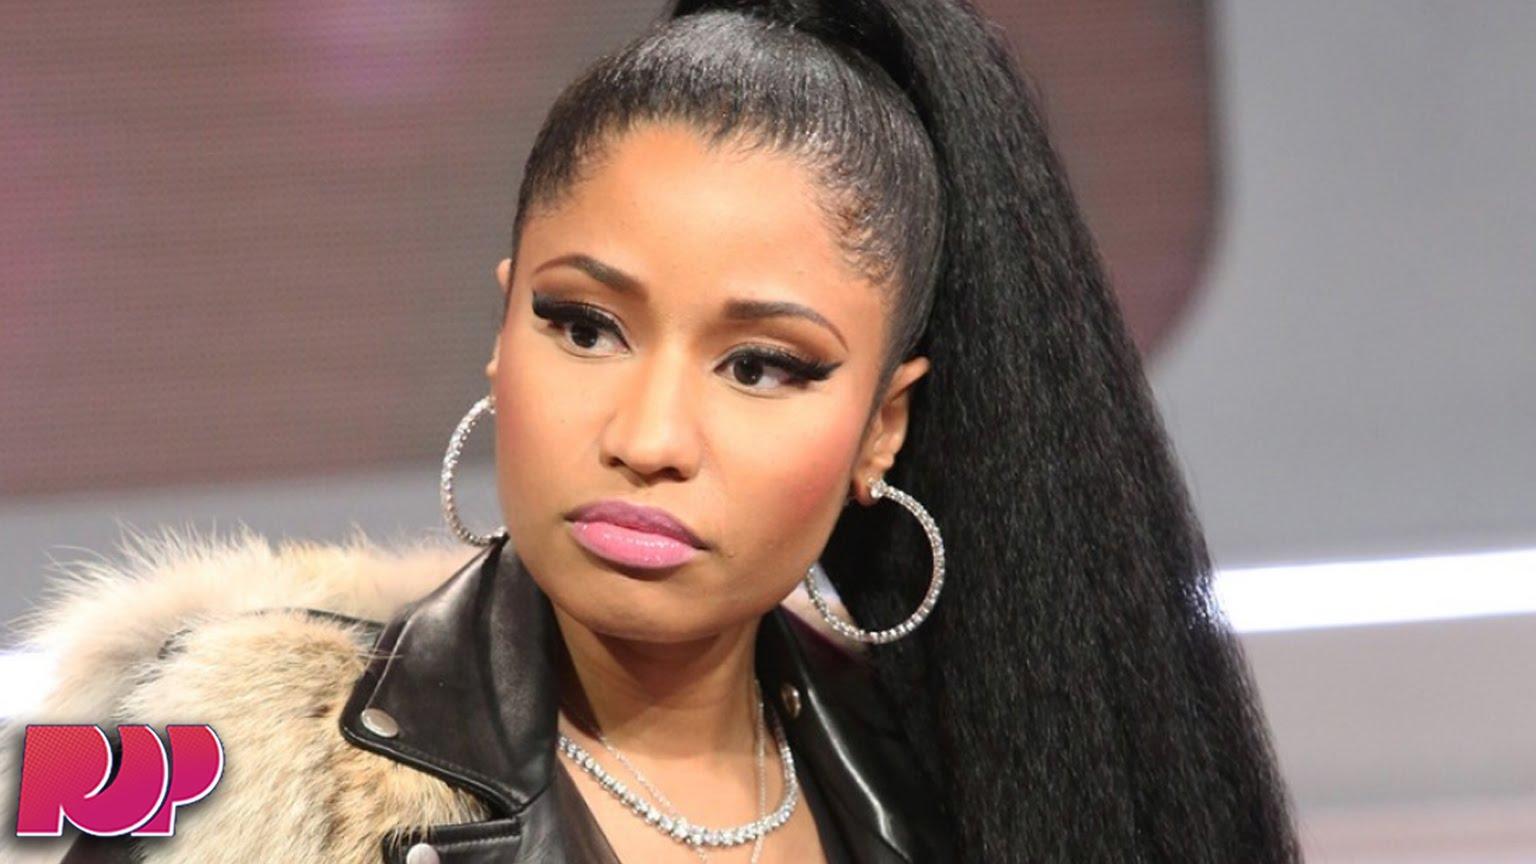 maxresdefault 15 8 Things You Didn't Know about Nicki Minaj